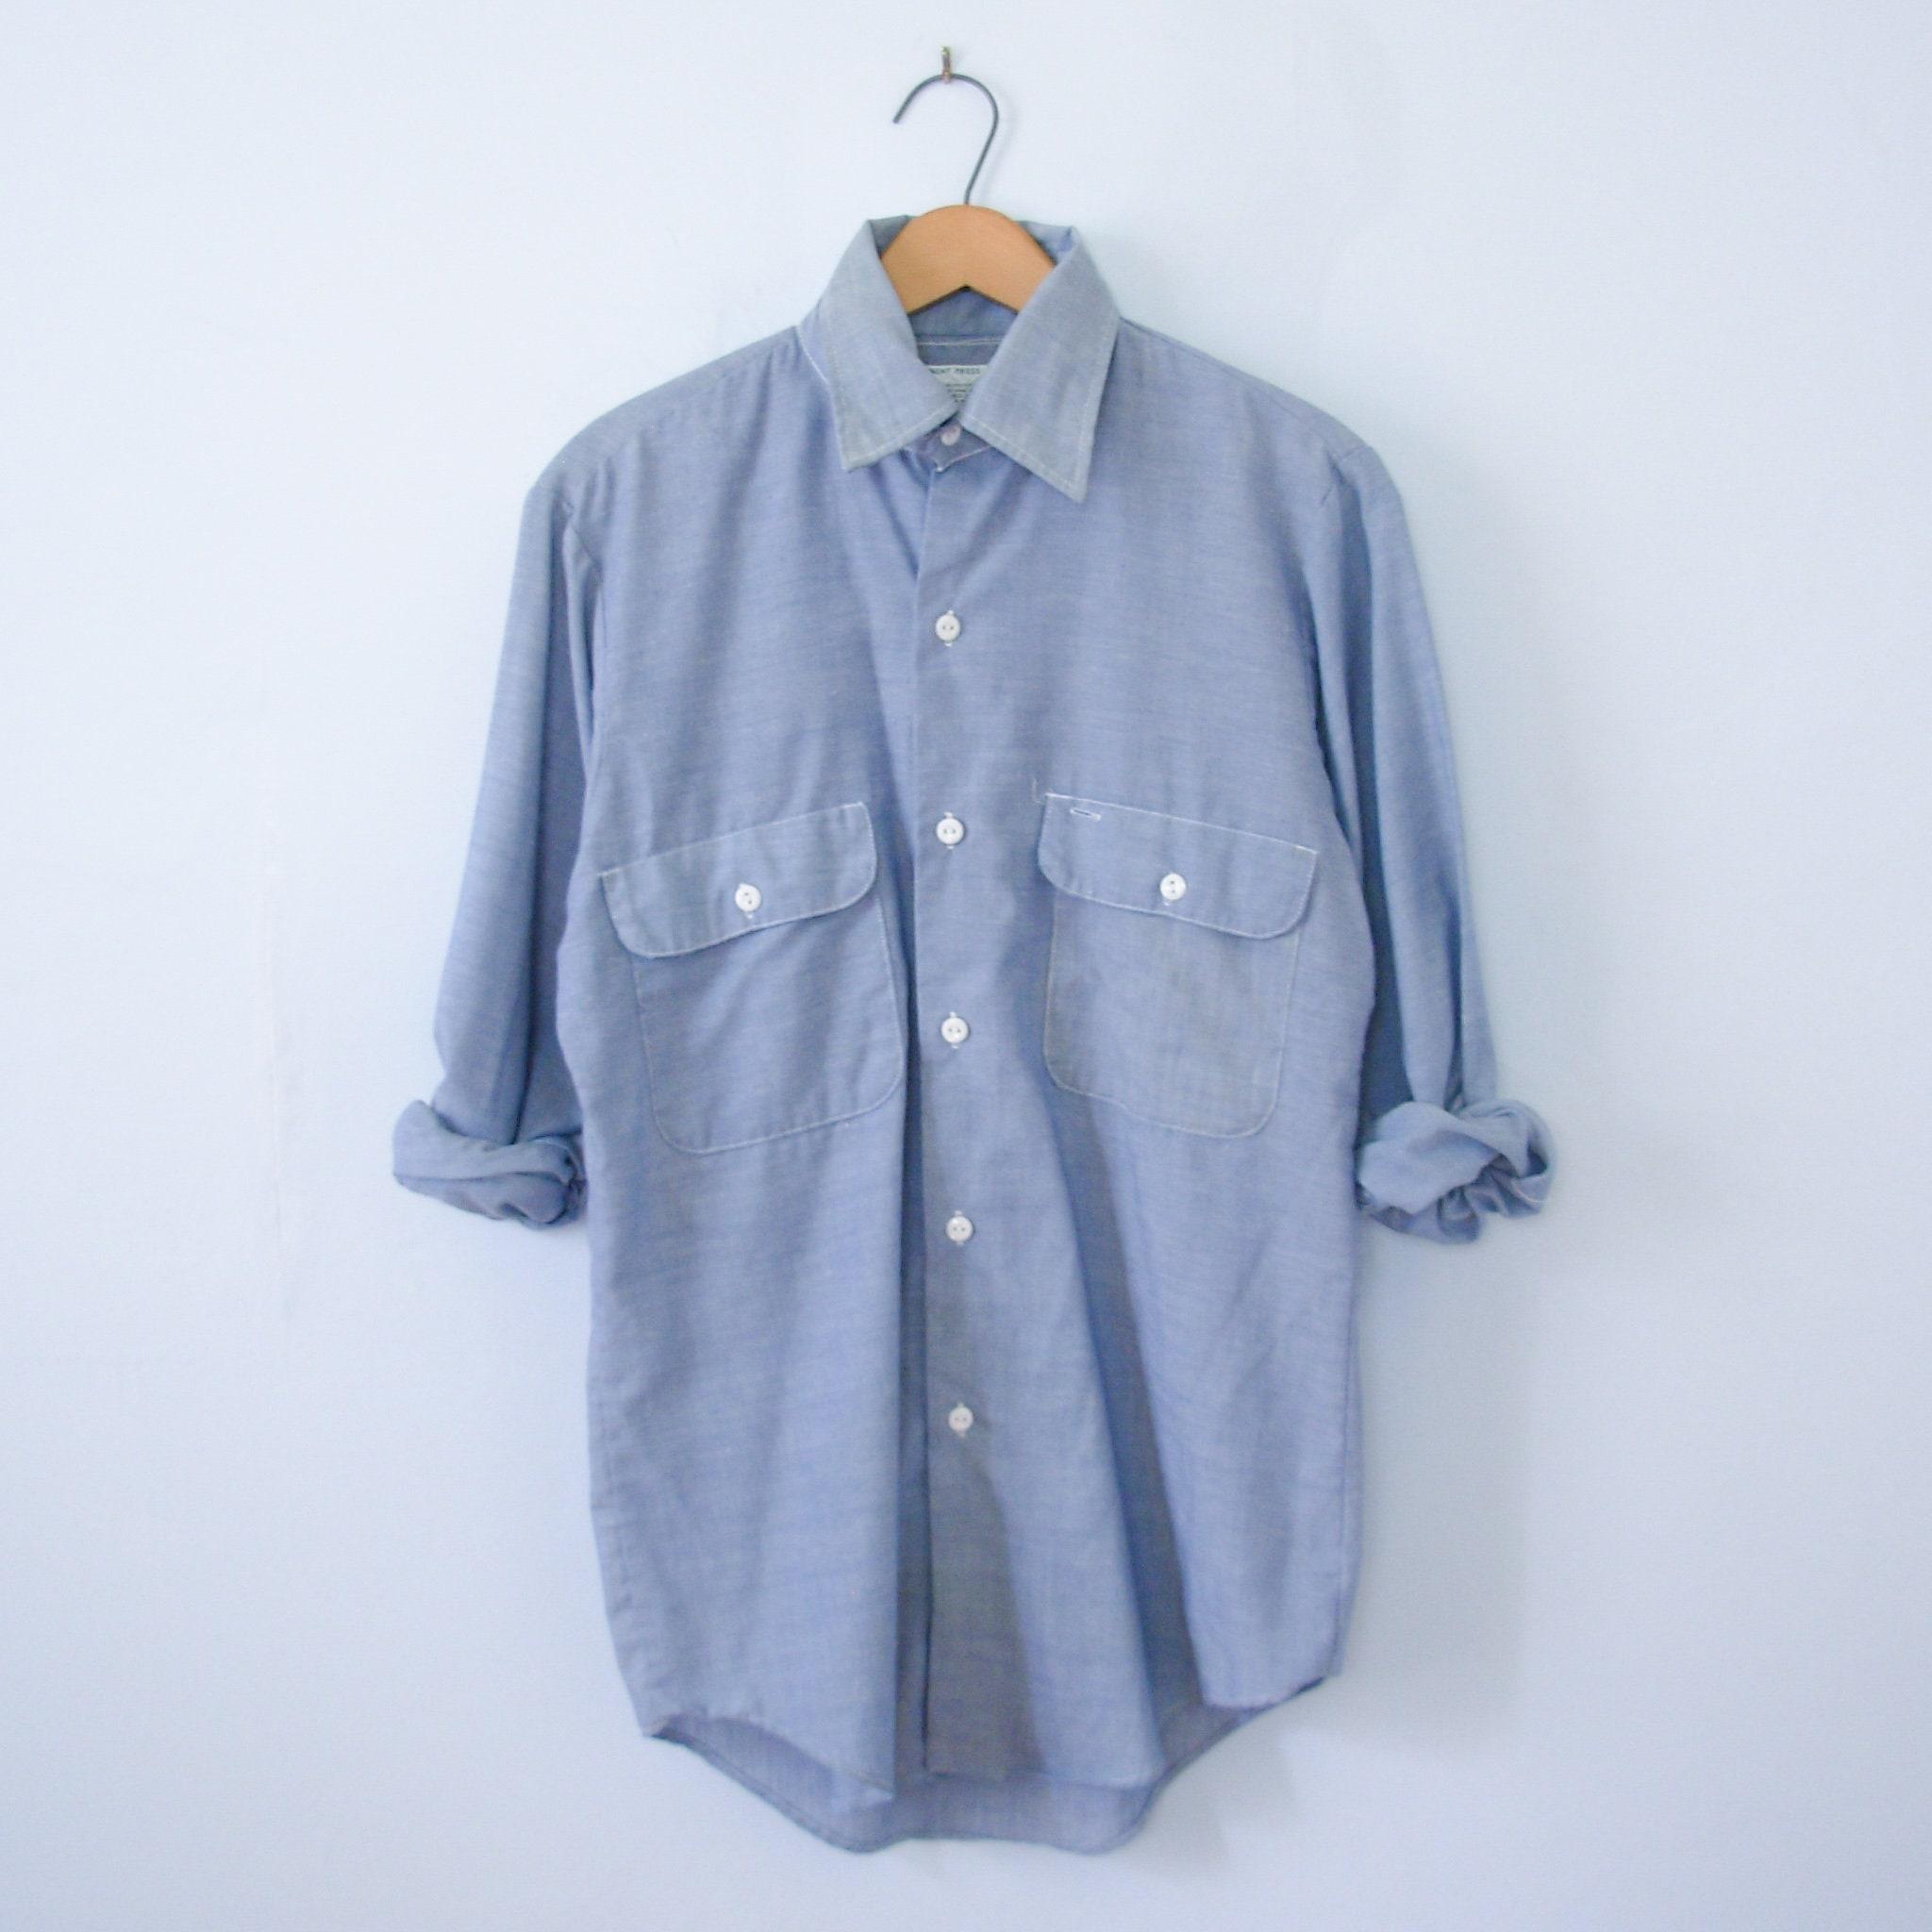 1970s Men's Shirt Styles – Vintage 70s Shirts for Guys Vintage 70s Chambray Denim Shirt, Mens Size Small $35.00 AT vintagedancer.com